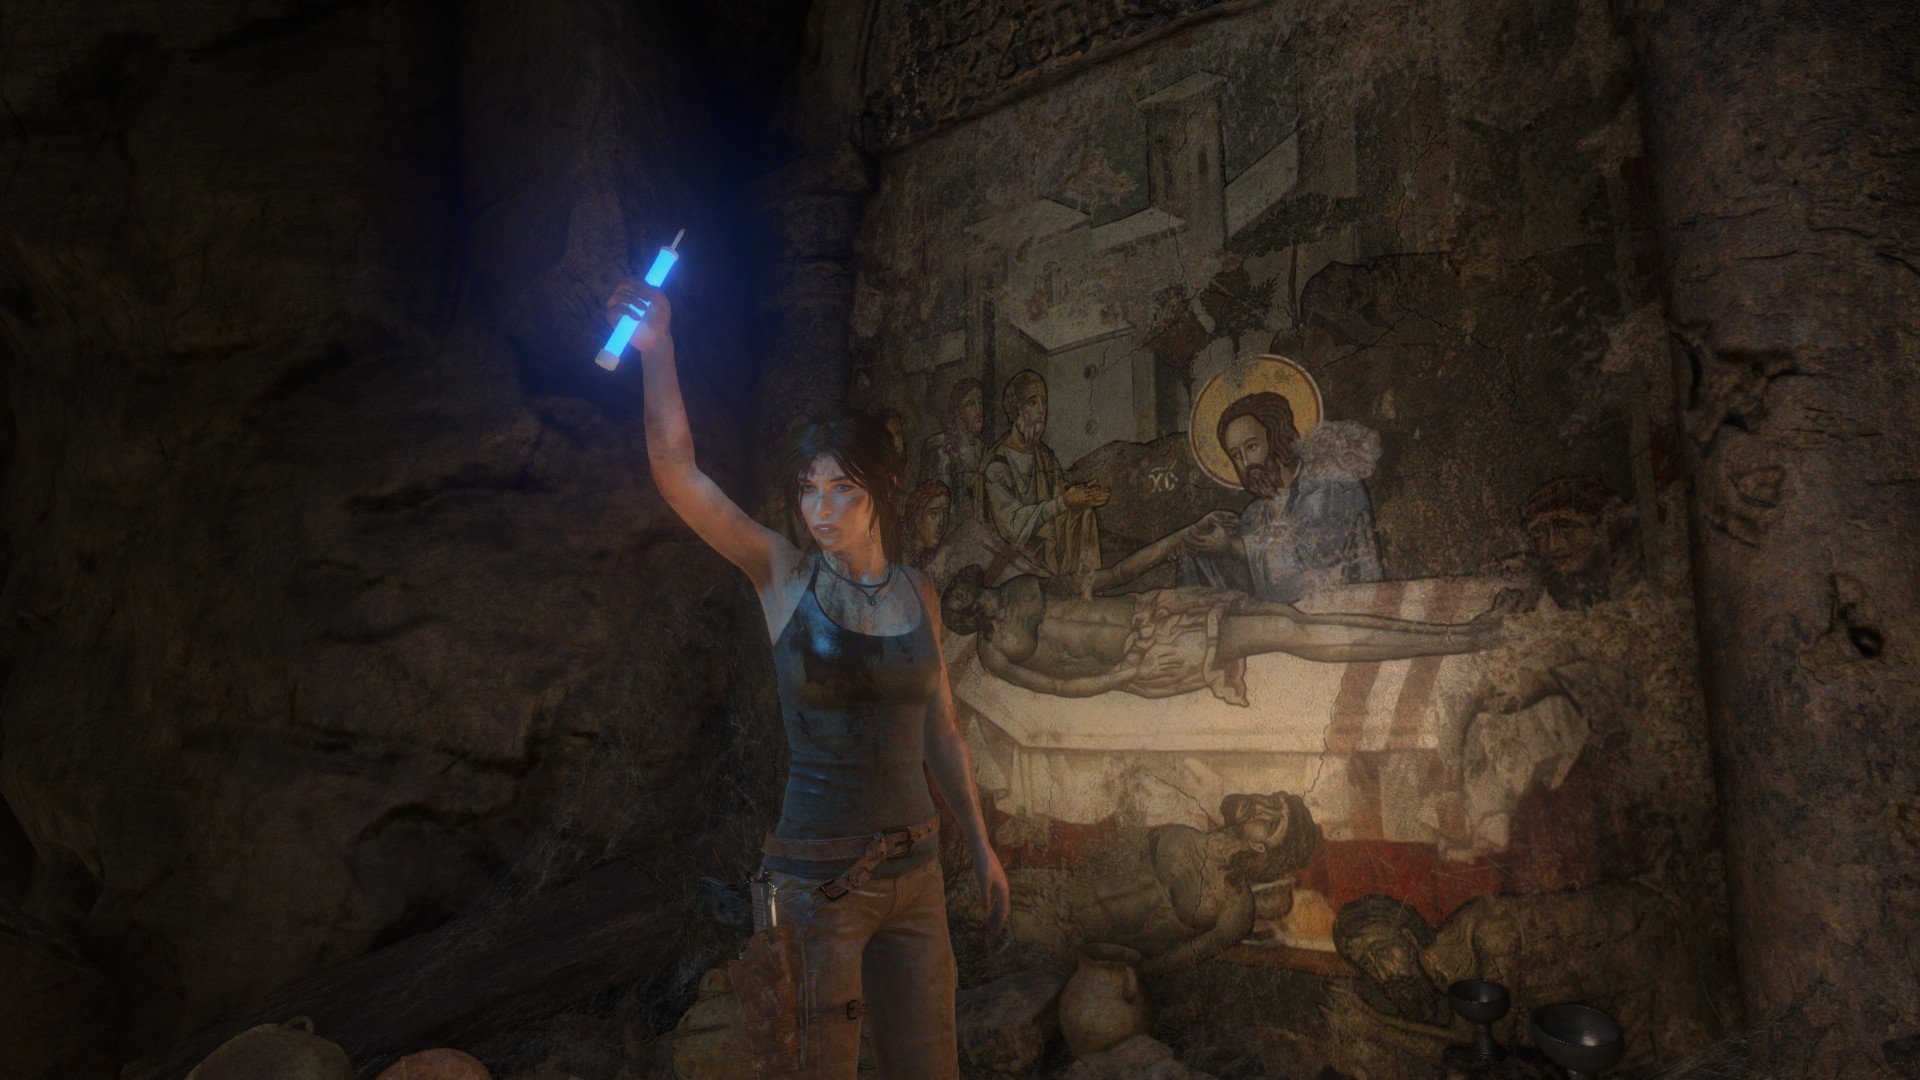 Rise of the Tomb Raider или да когда же этот медведь сдохнет?. - Изображение 28